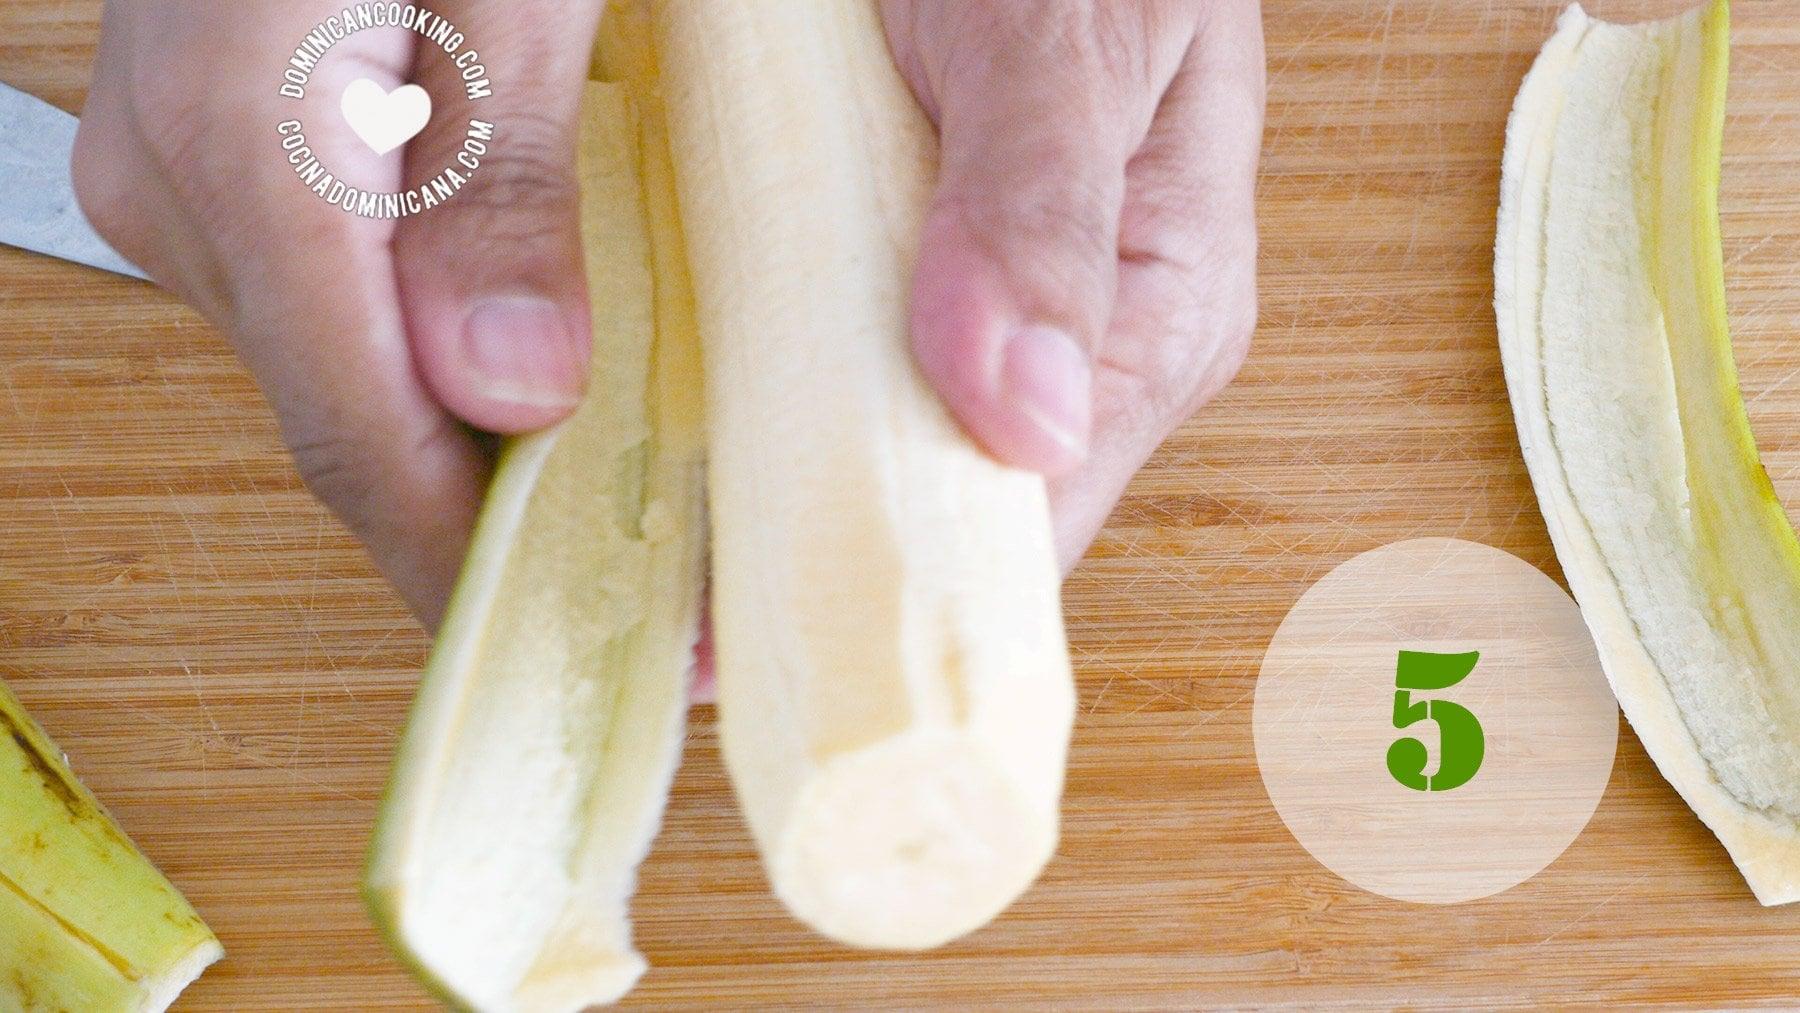 Cómo pelar plátanos machos